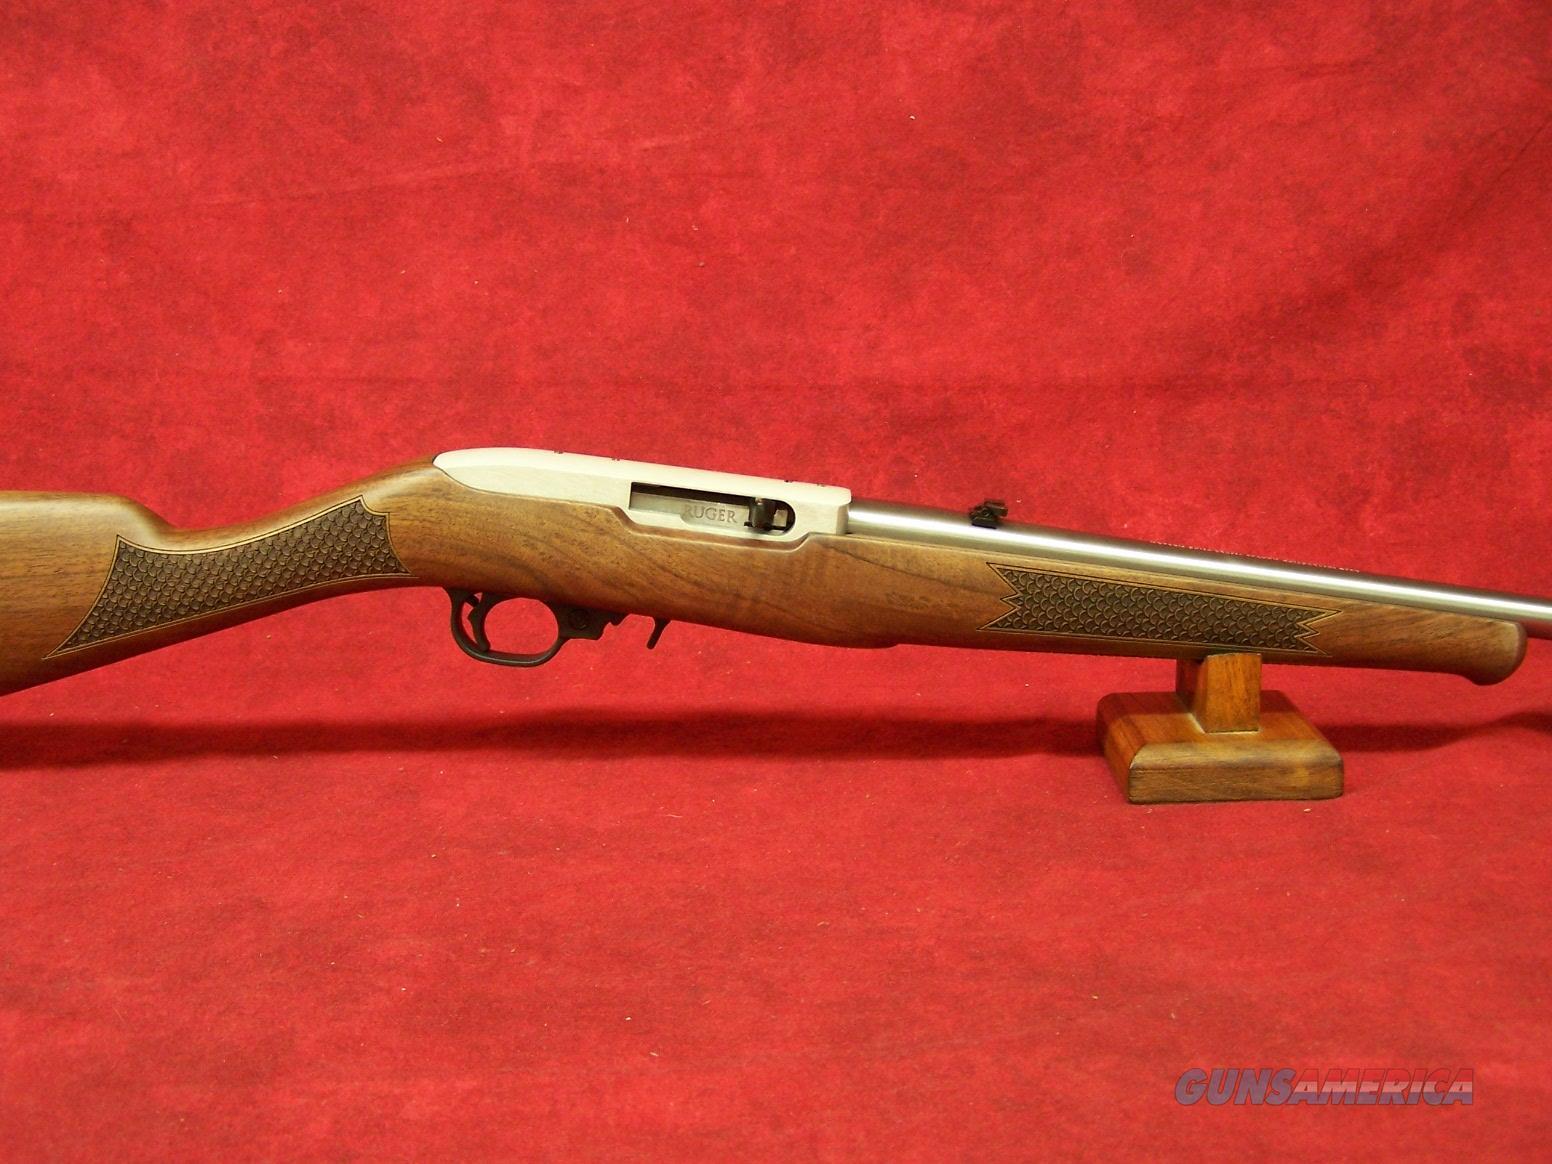 "Ruger 10/22 CLASSIC V 22LR SS BLACK WALNUT TALO 20"" (01297)  Guns > Rifles > Ruger Rifles > 10-22"